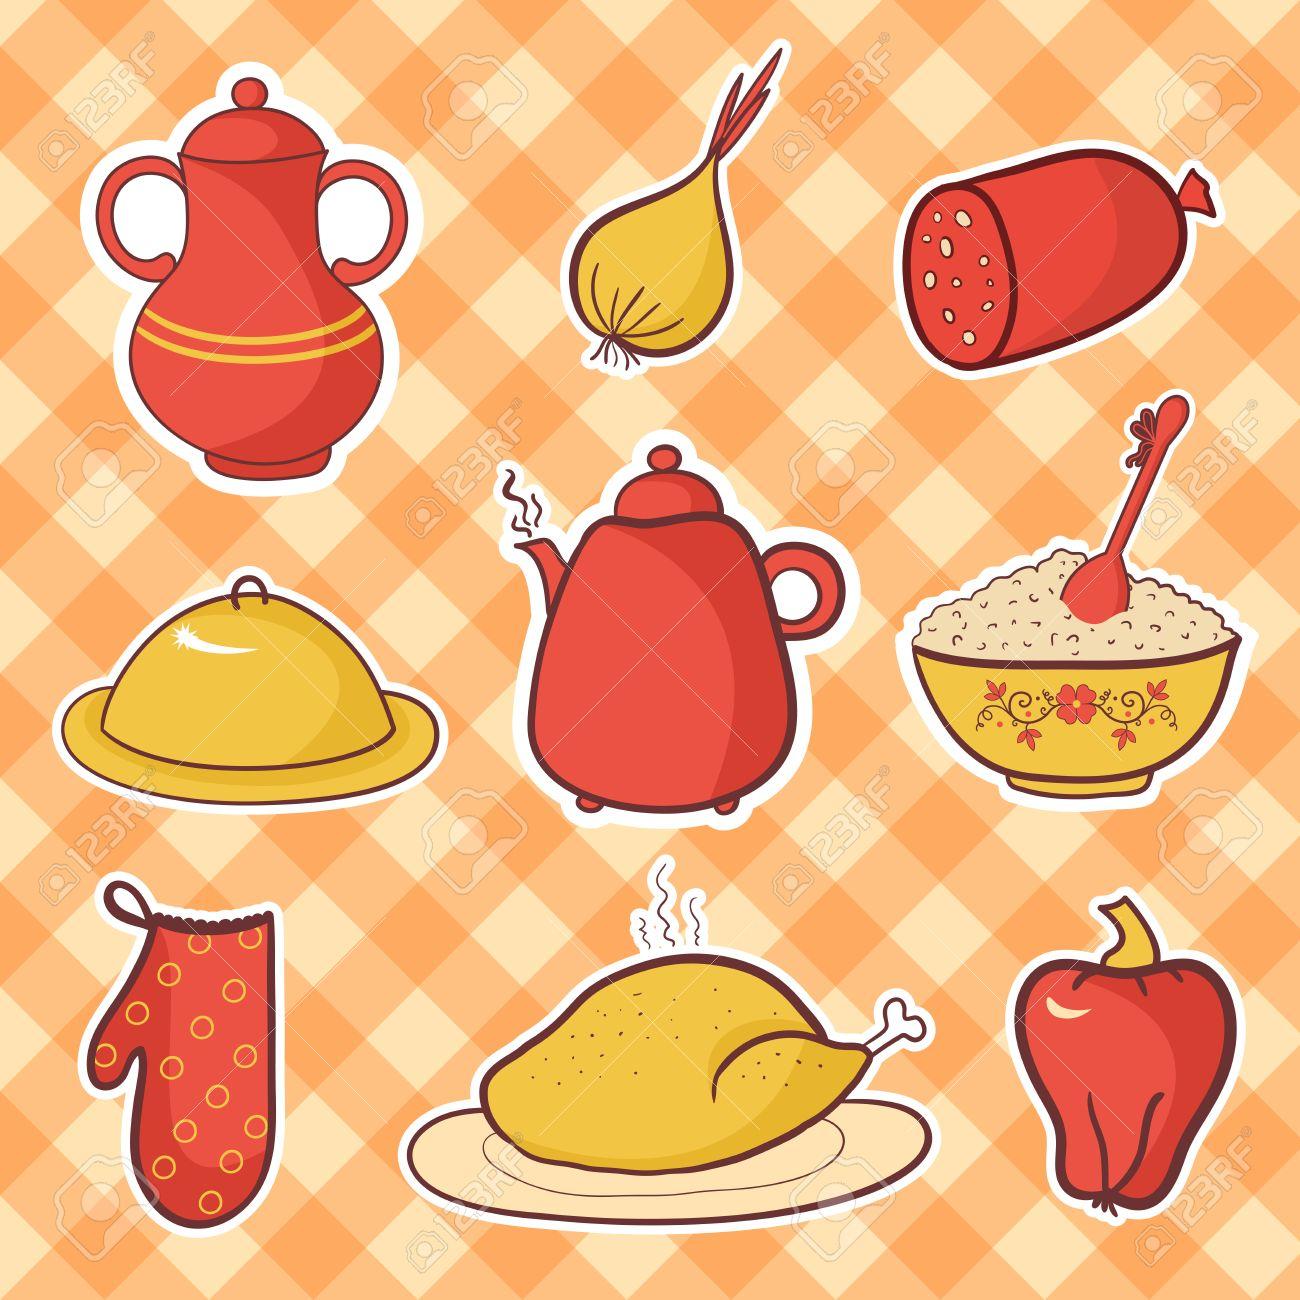 Retro Kitchen Set Food Cartoon Vector Elements Royalty Free